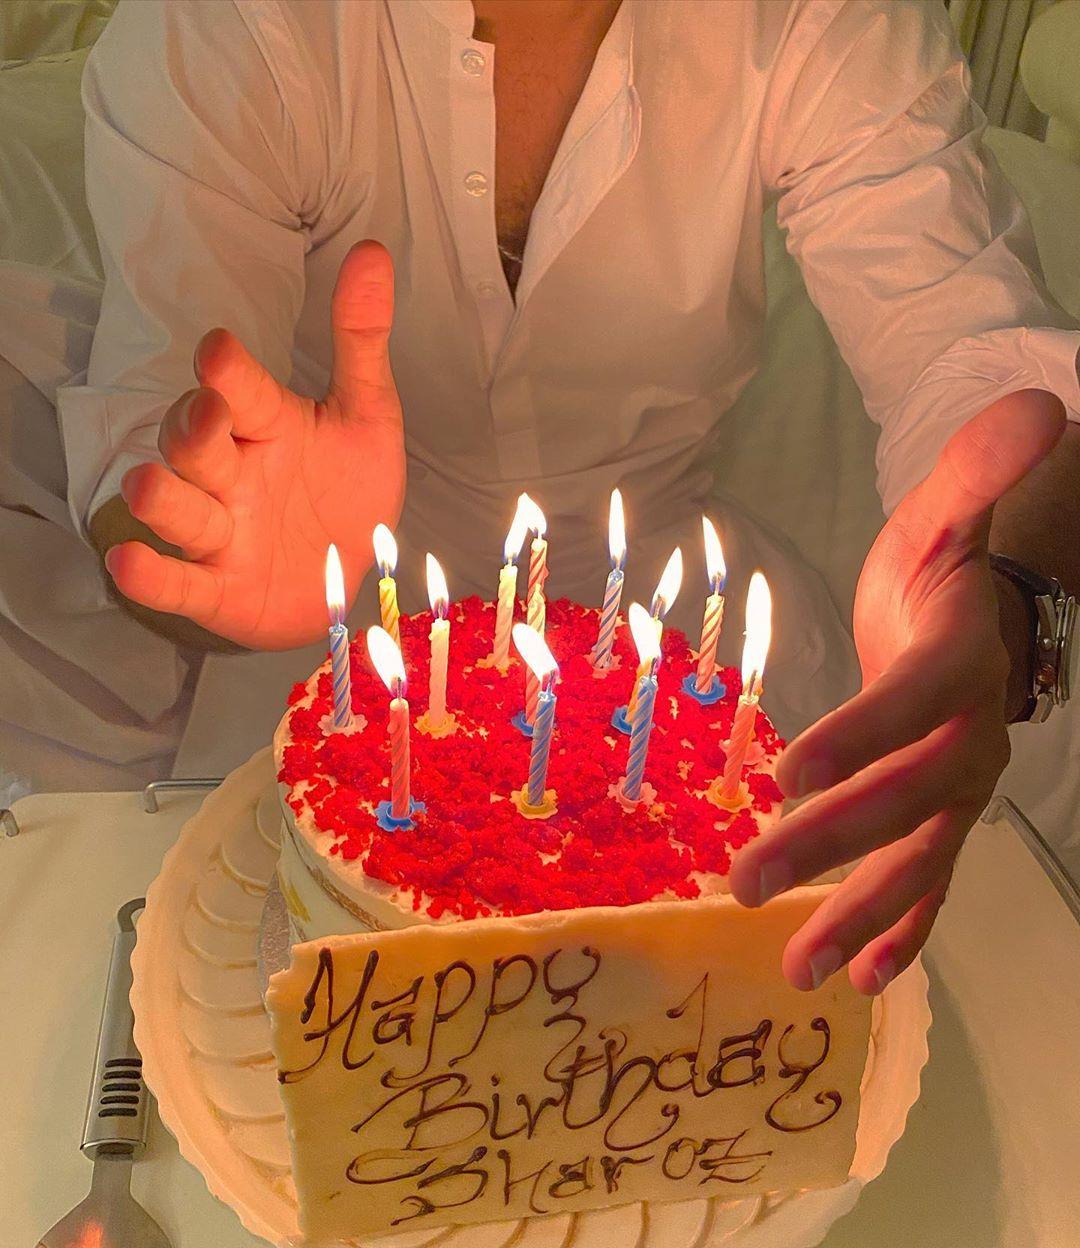 Sadaf Kanwal Celebrating her Birthday with Shahroz - Pictures